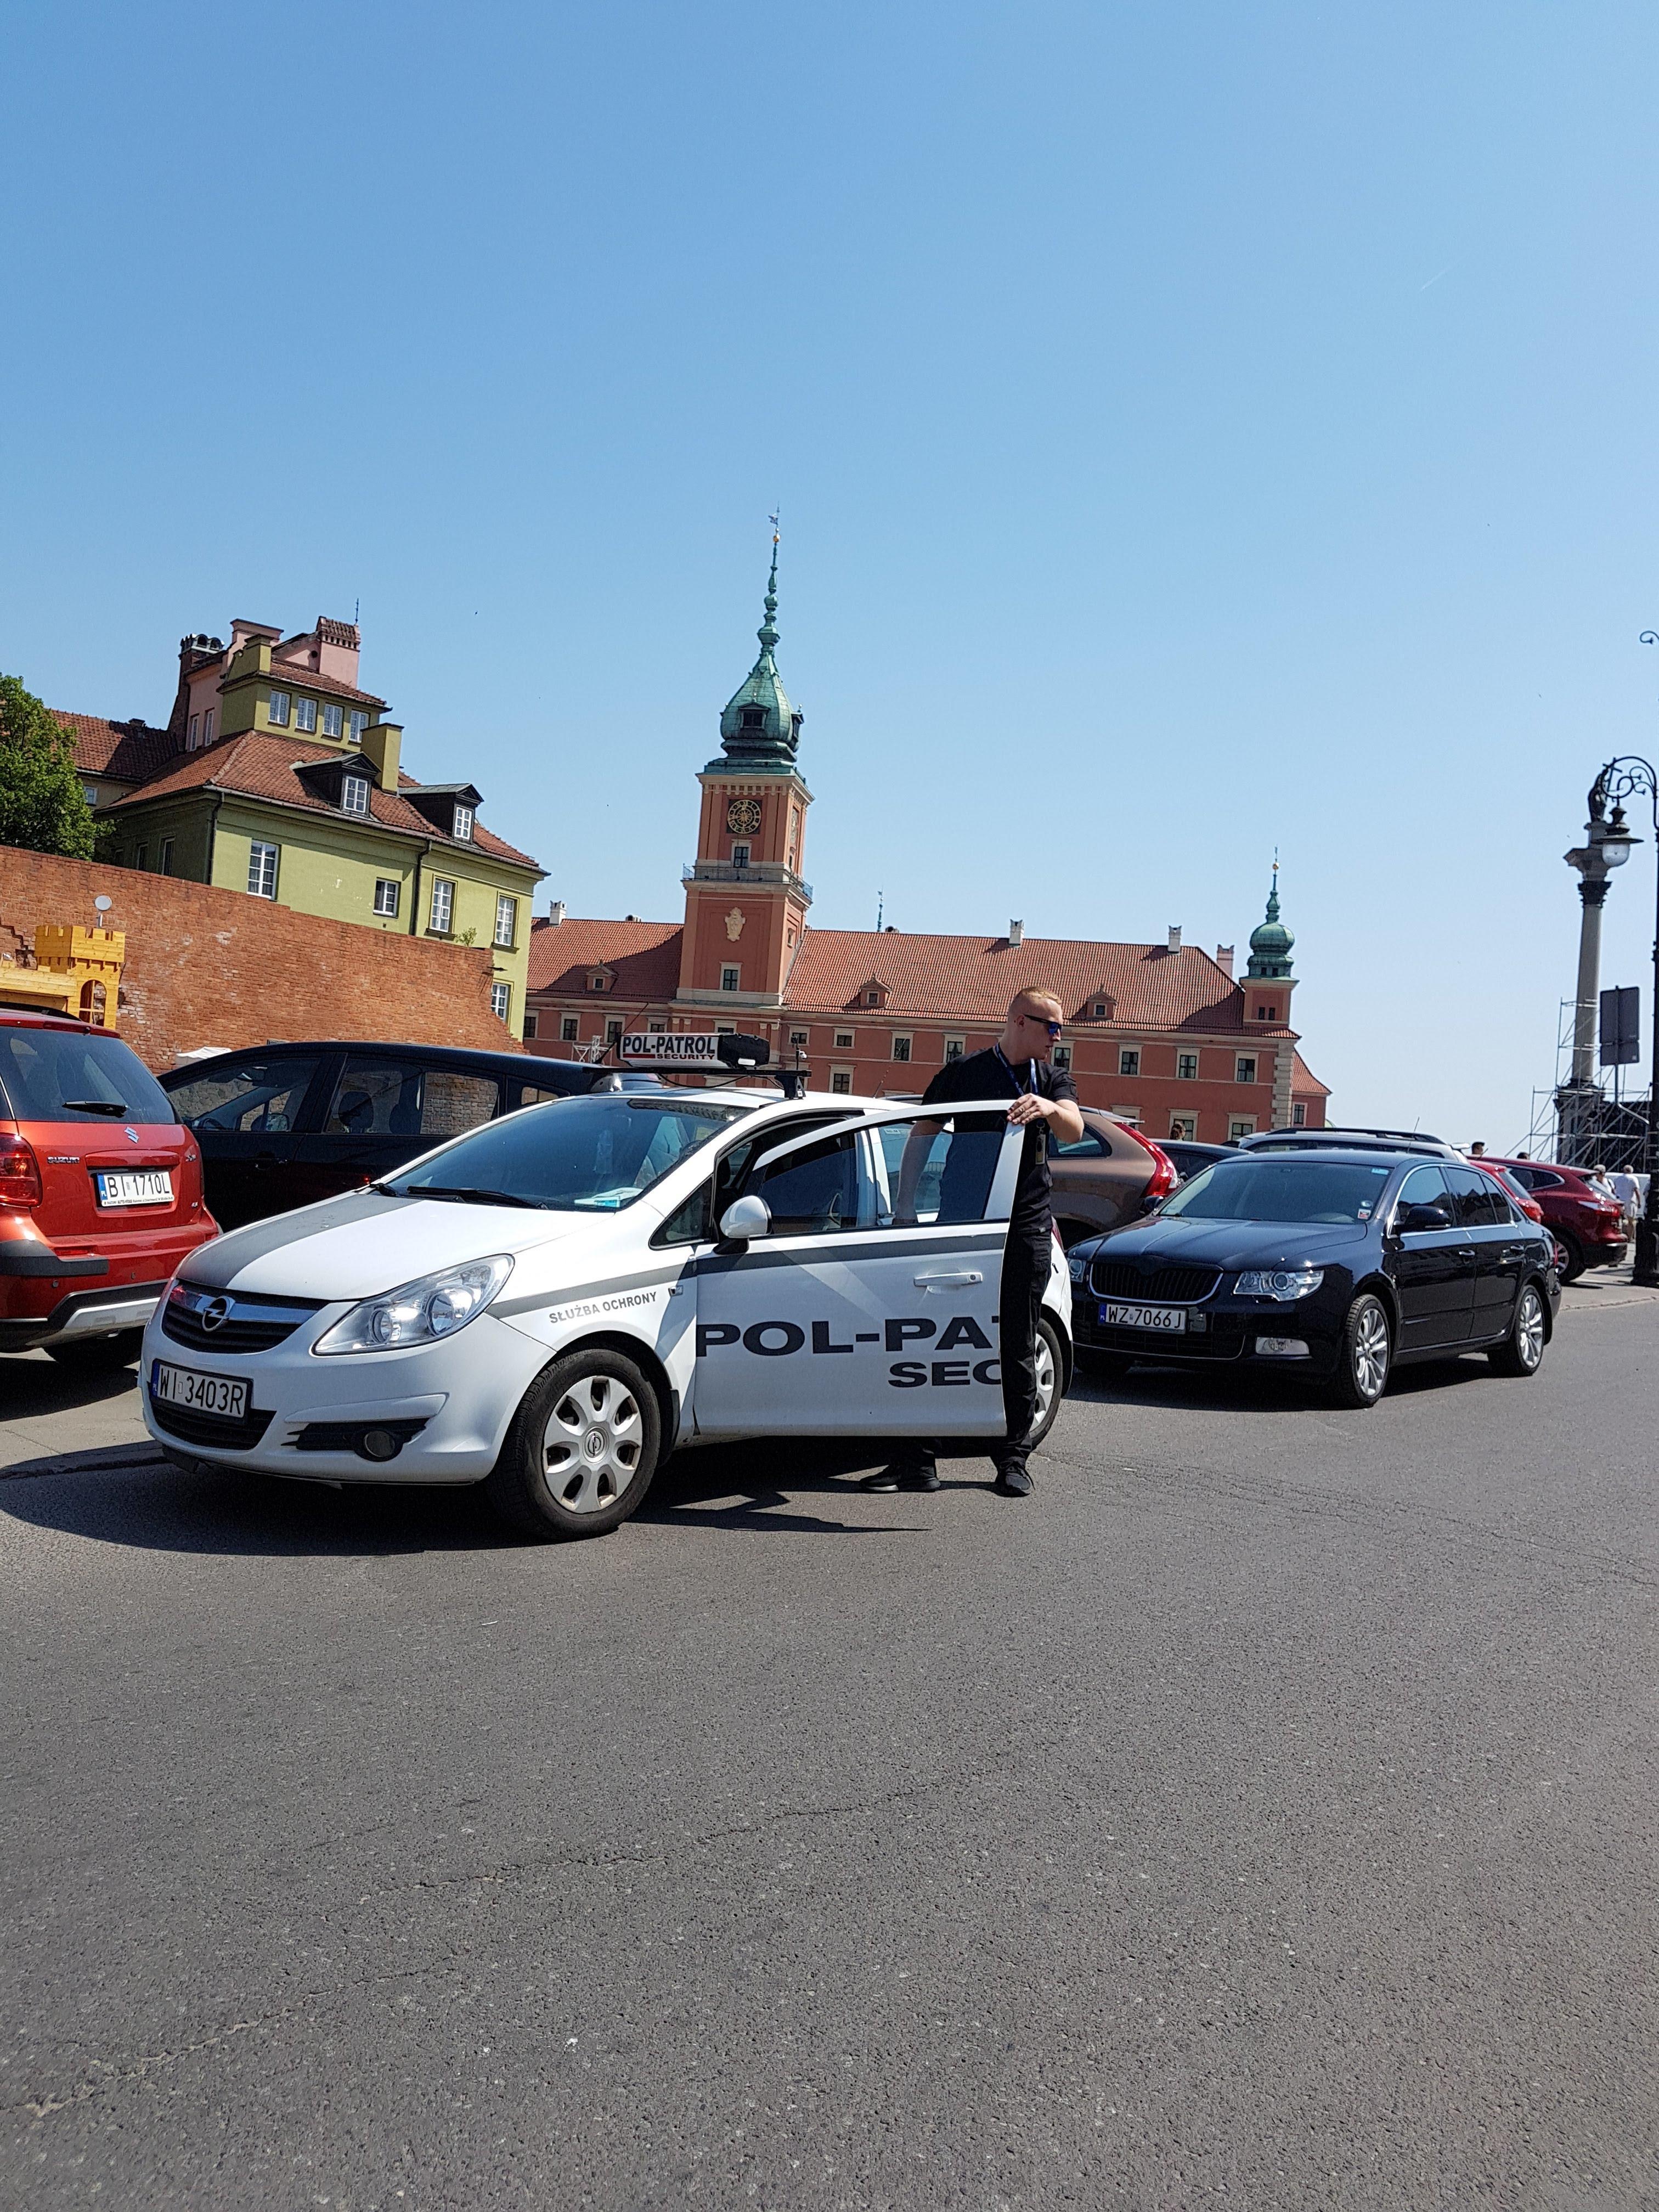 Pol-Patrol-Security Agencja Ochrony